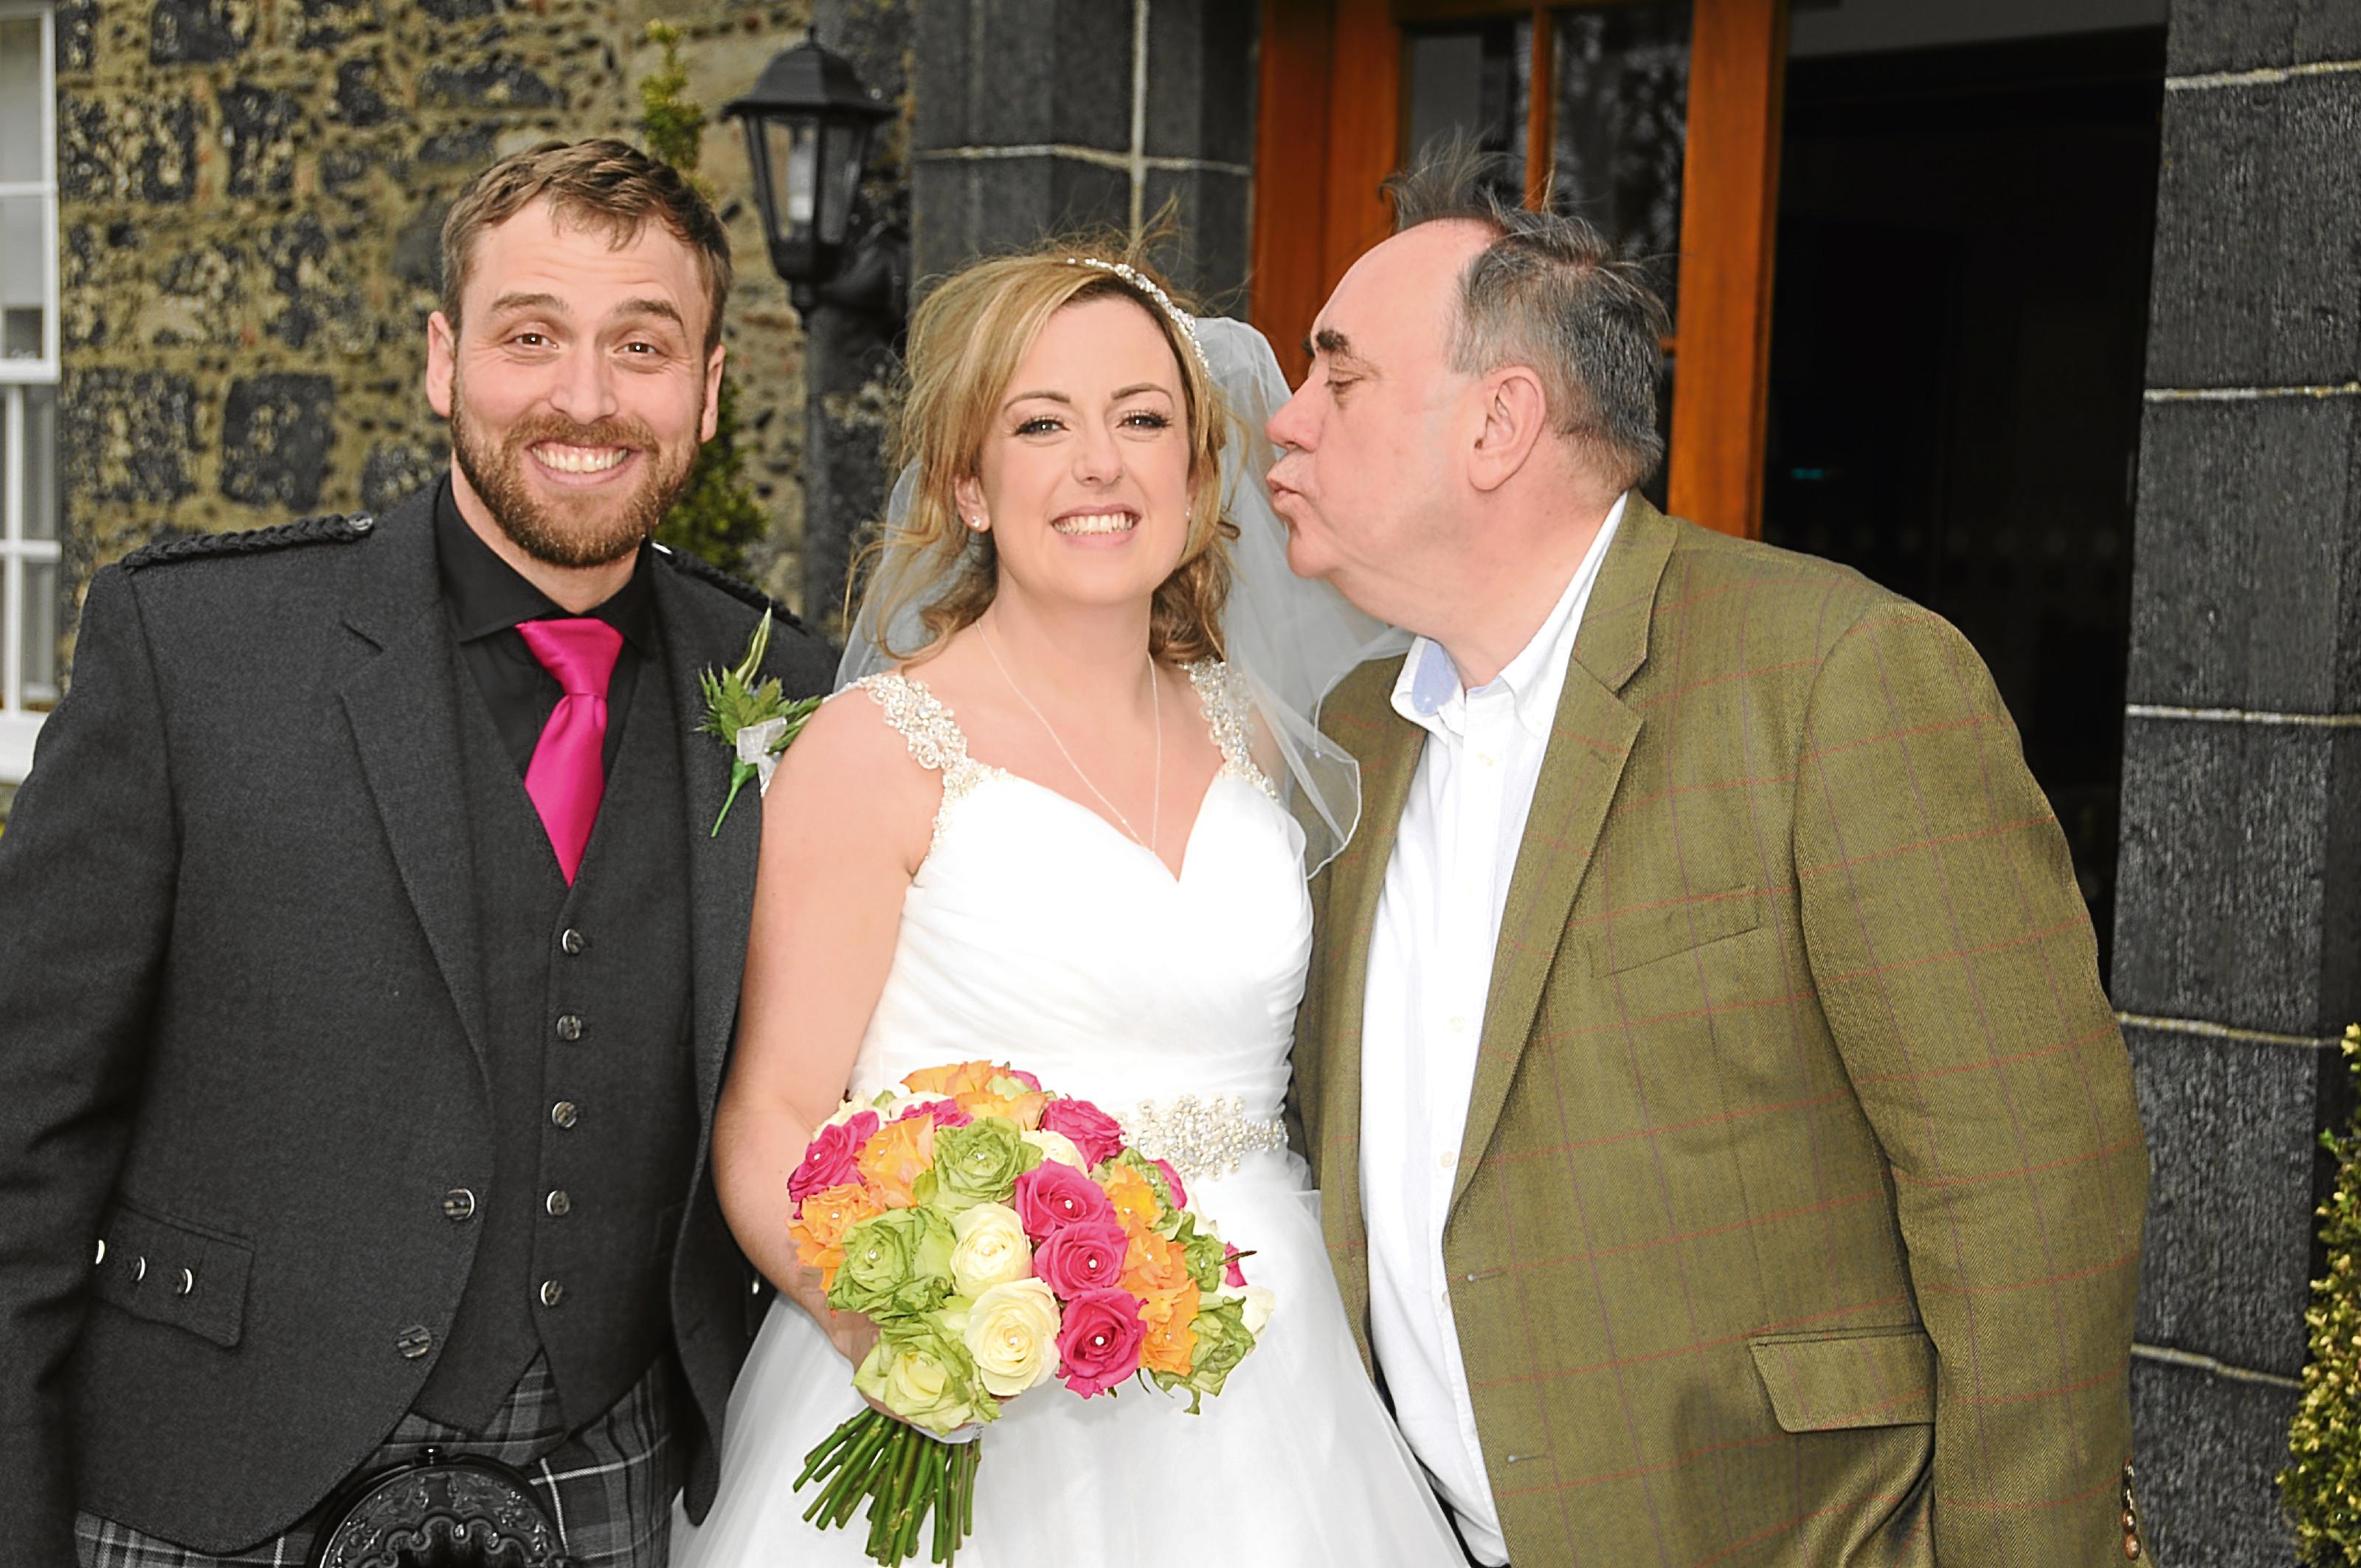 Richard and Stephanie with Alex Salmond on their wedding day.